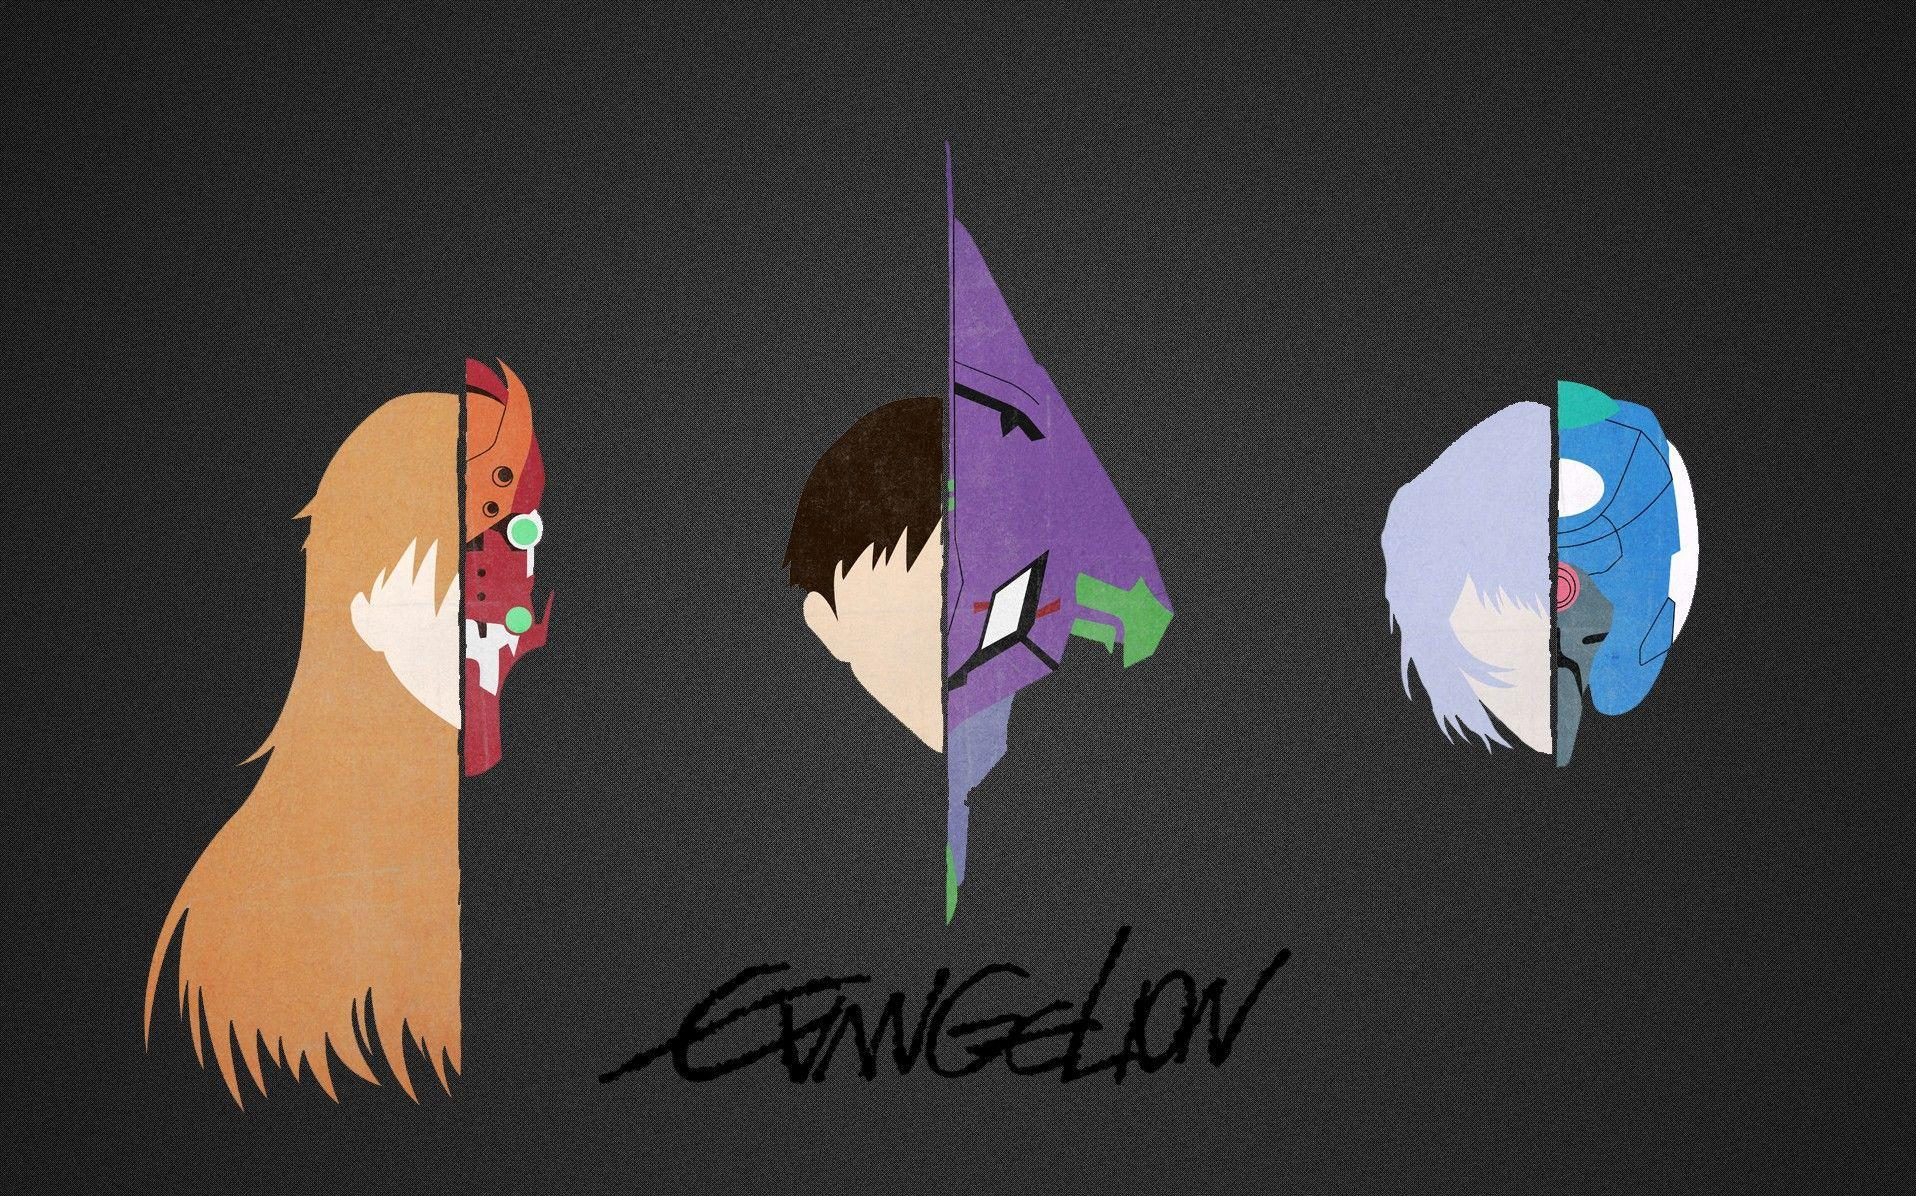 Evangelion Backgrounds - Wallpaper Cave